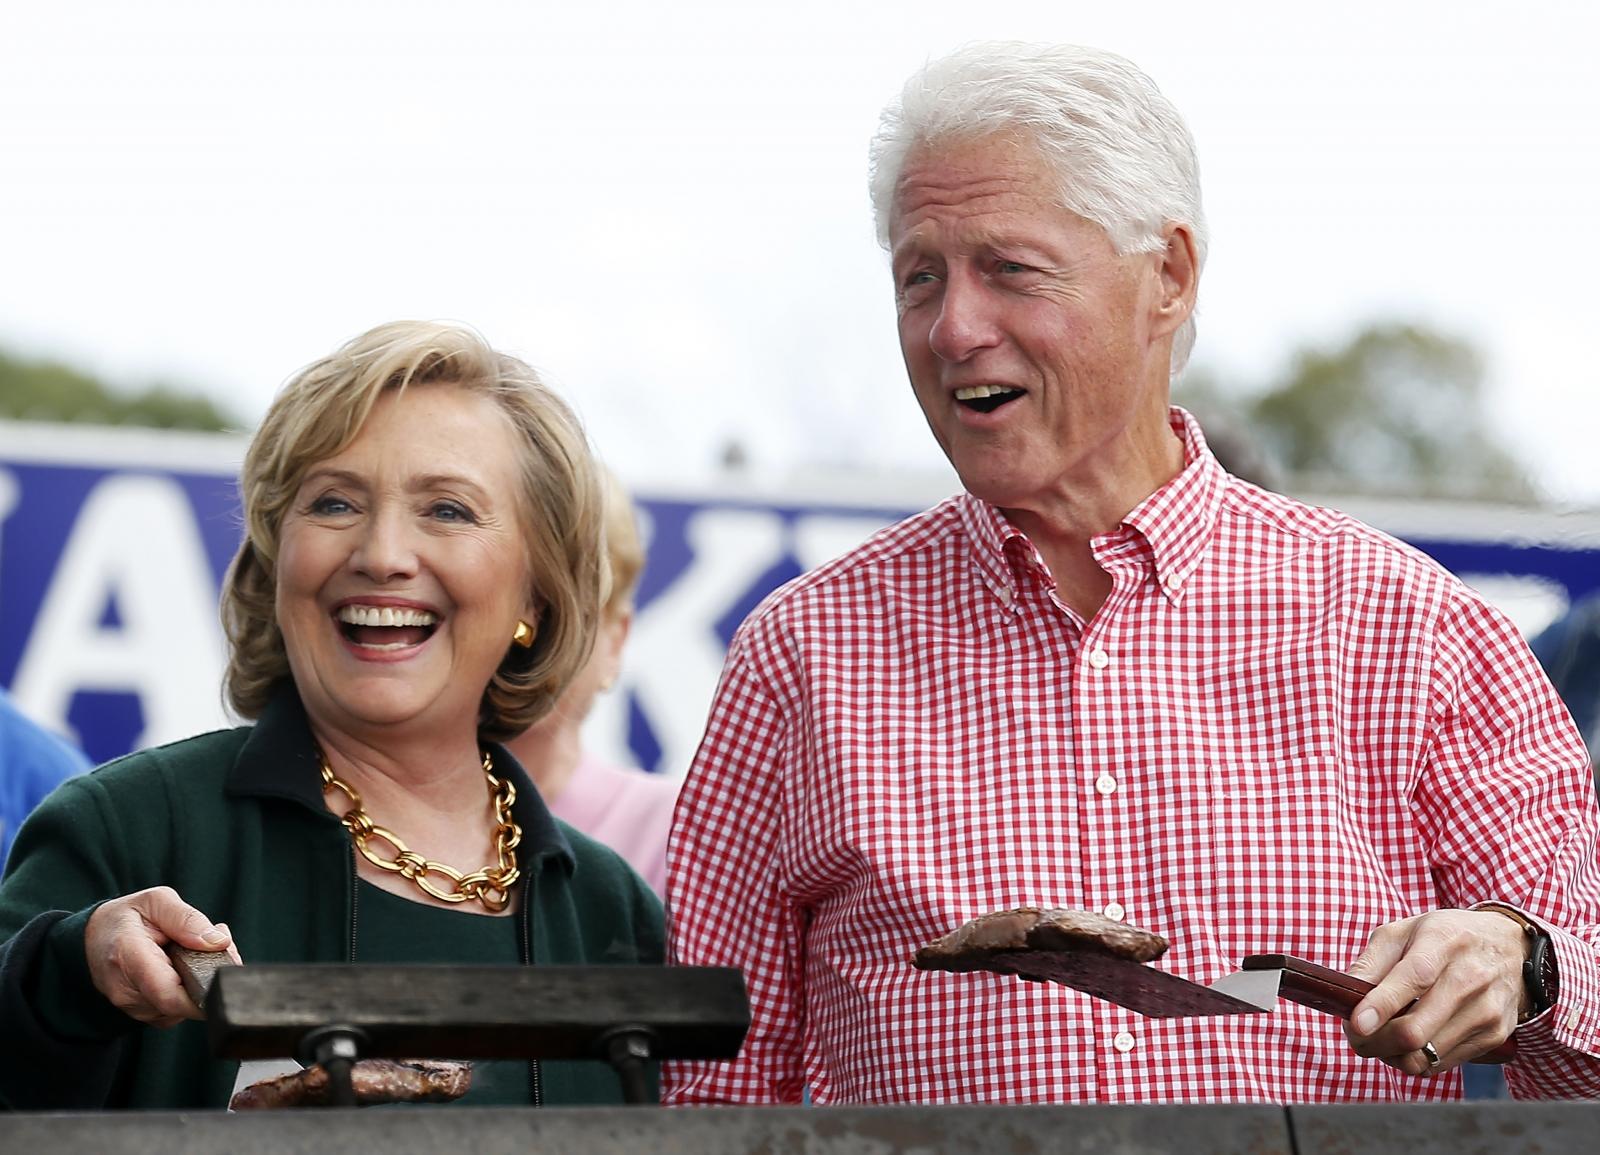 Clintons At Iowa Steak Fry